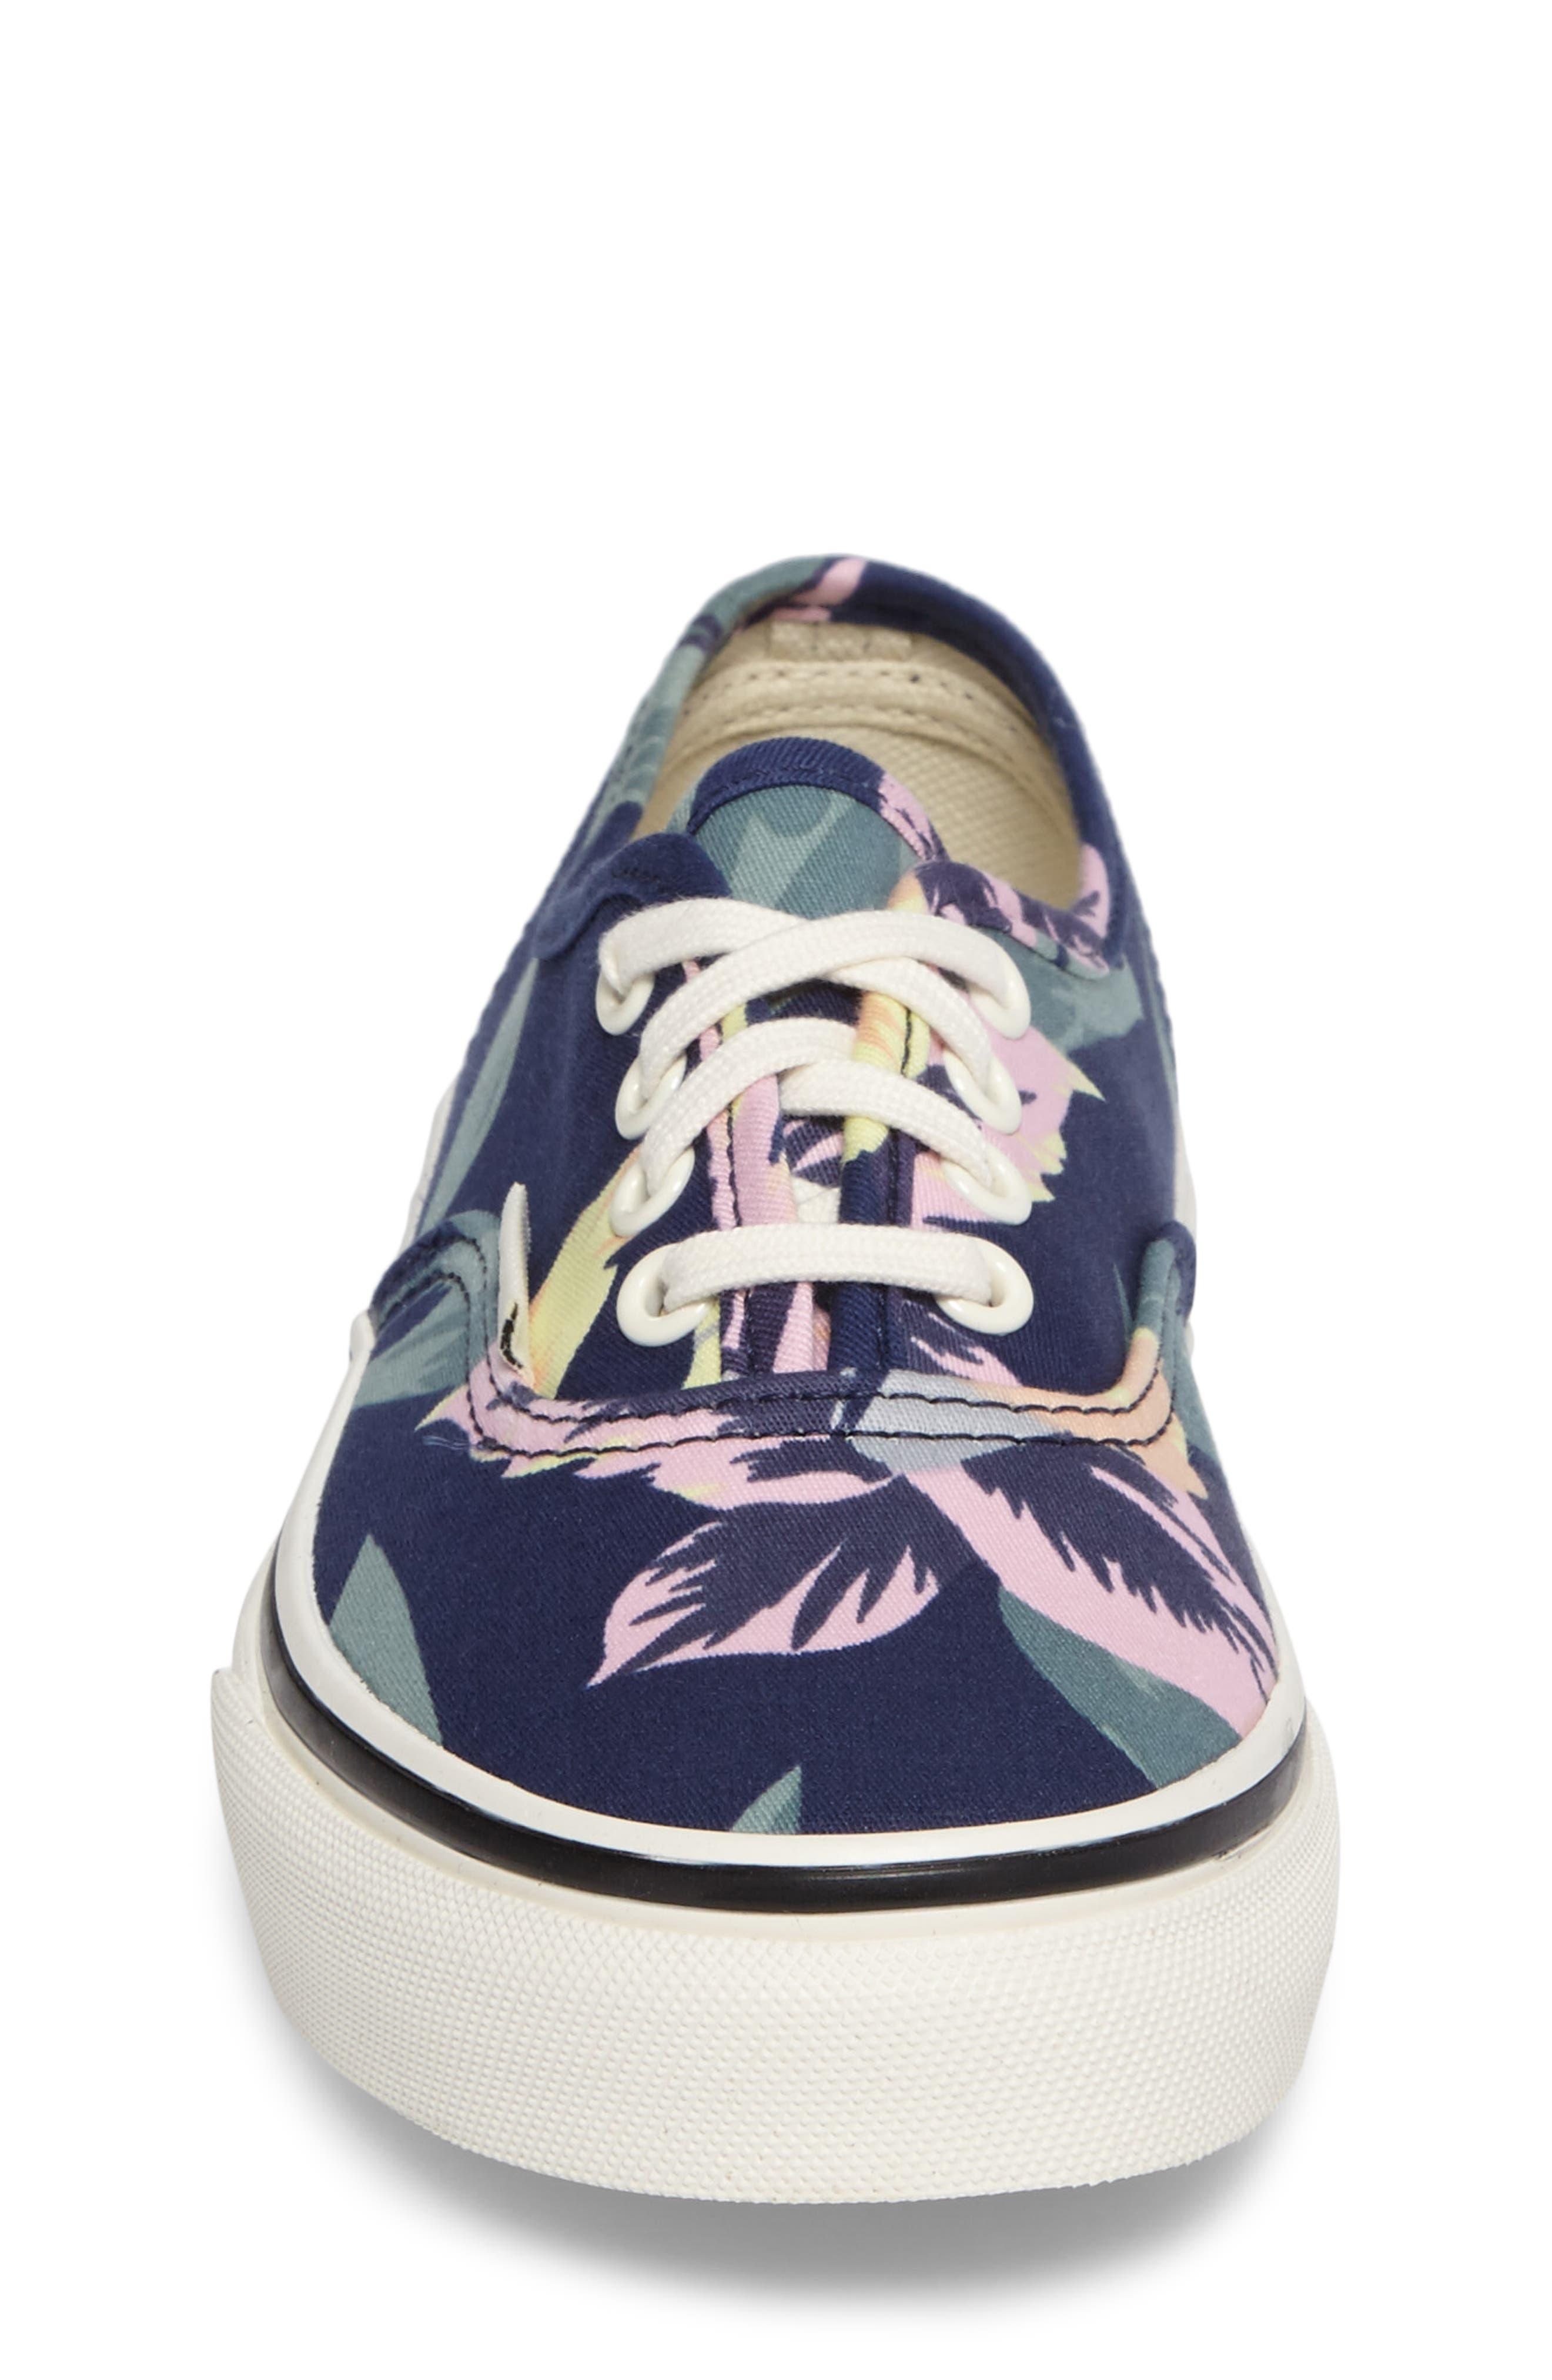 Alternate Image 4  - Vans Authentic Floral Print Sneaker (Toddler, Little Kid & Big Kid)